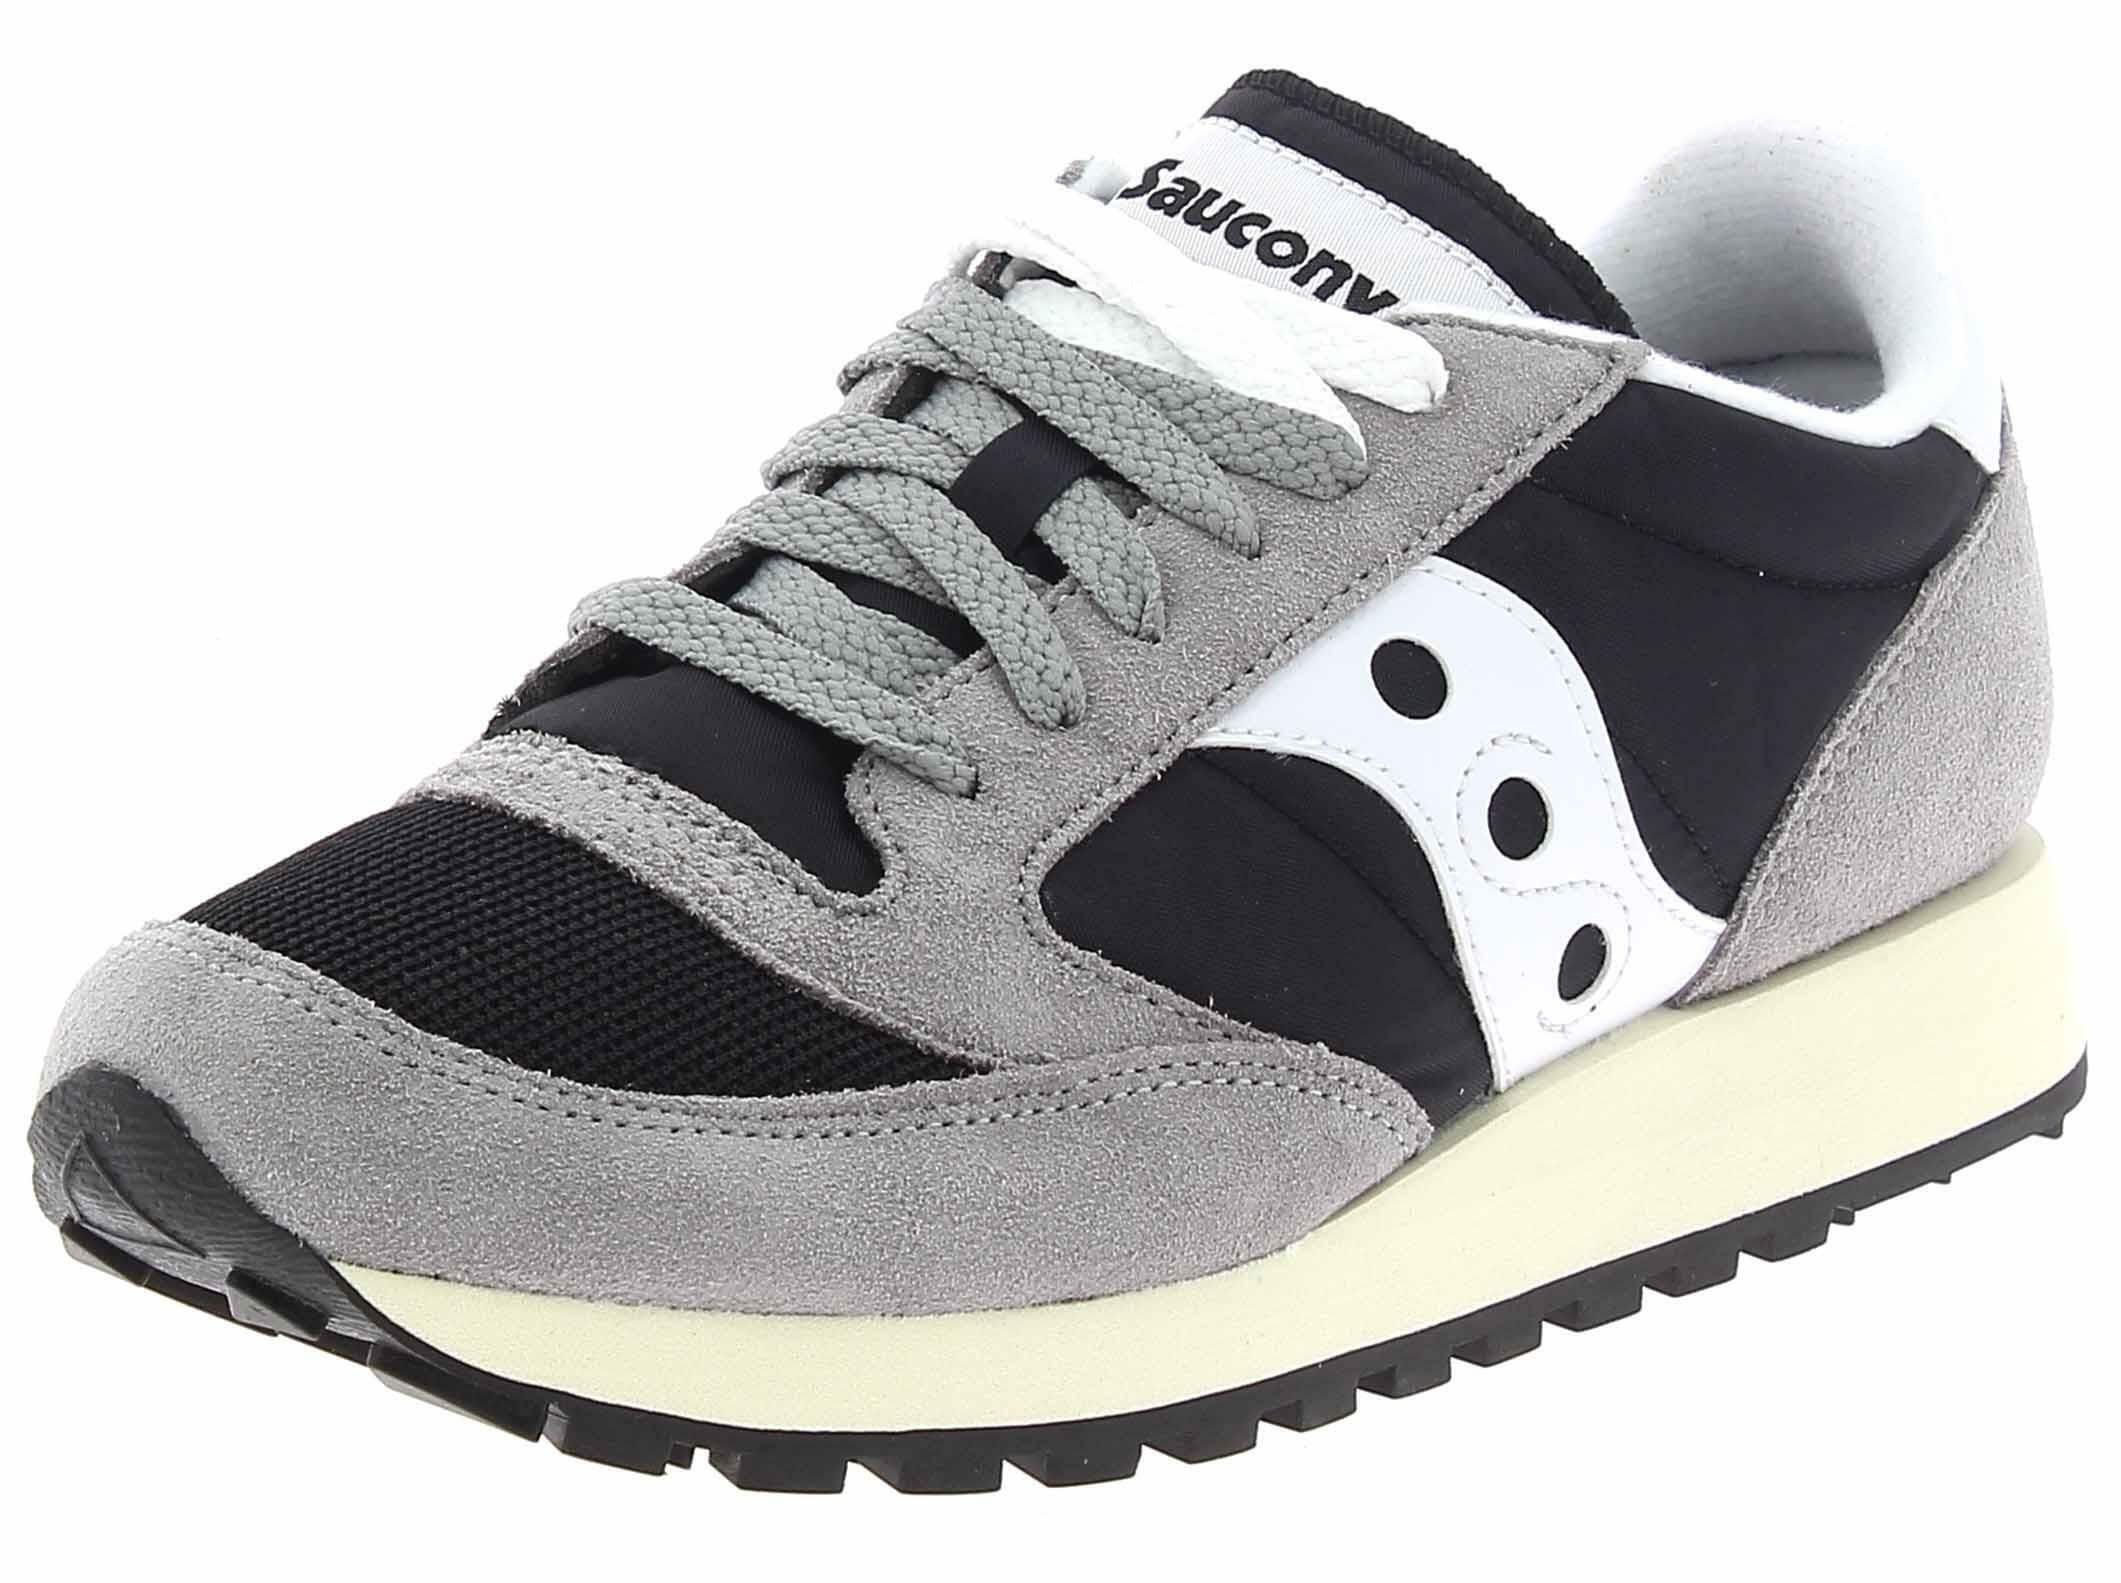 Saucony jazz original vintage scarpe sportive donna grigie s6036843